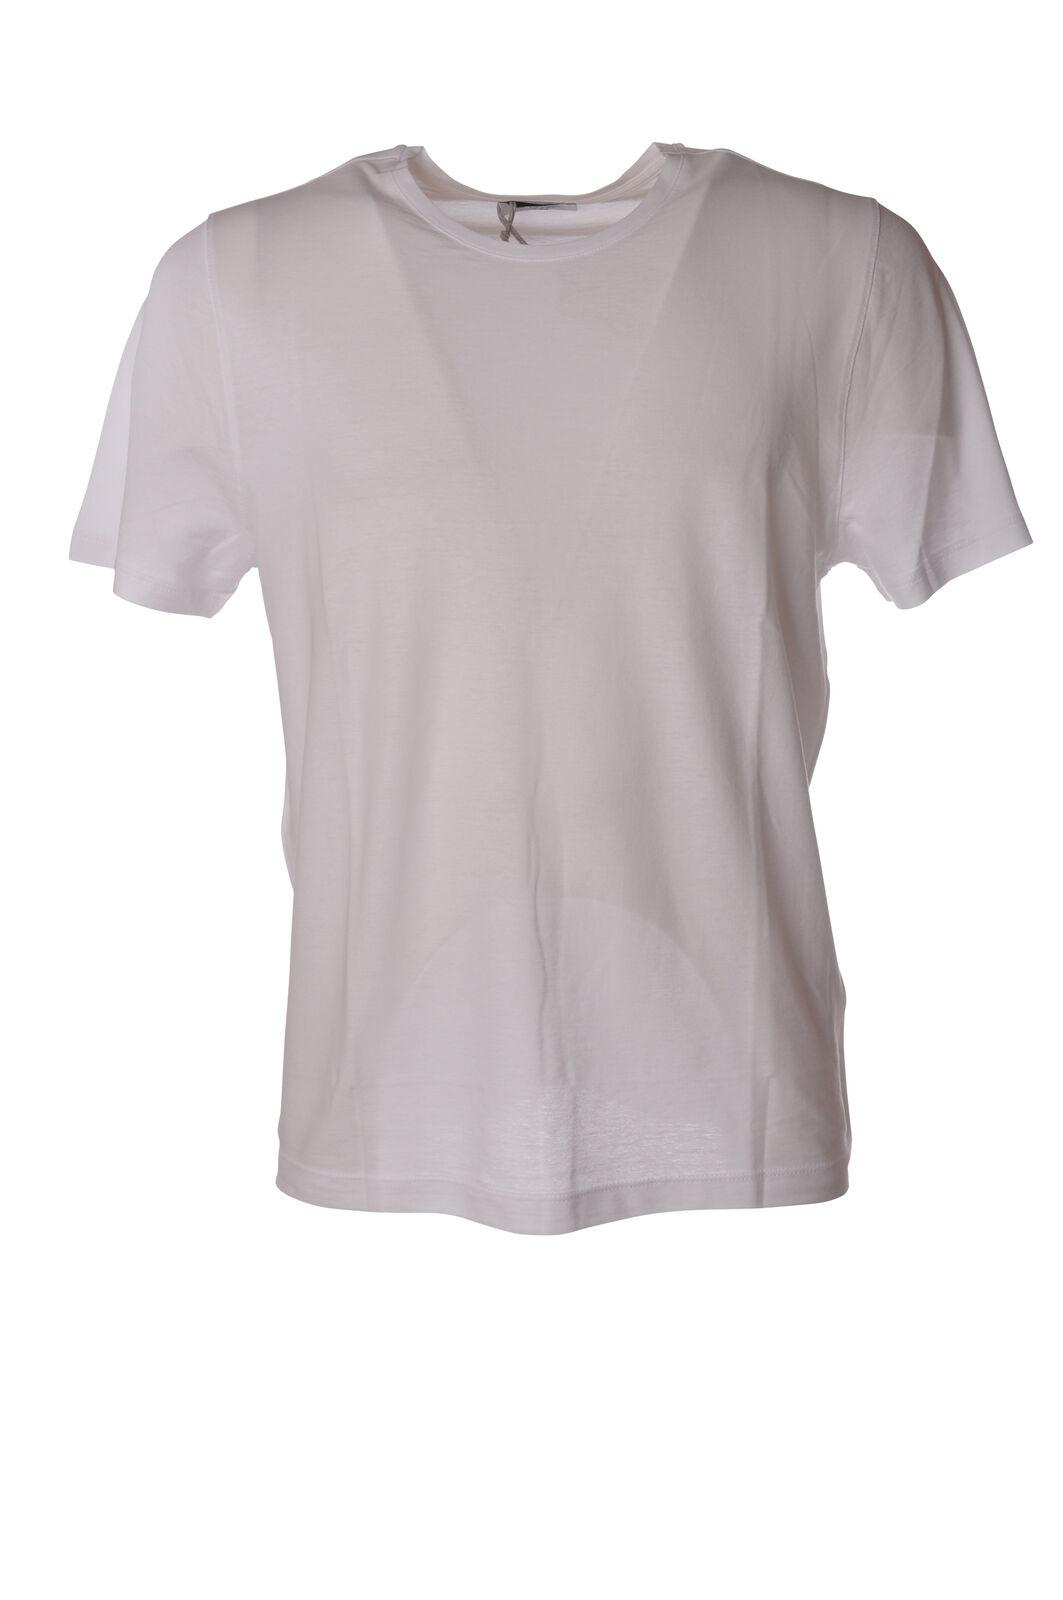 Heritage - Topwear-T-shirts - Man - White - 5221716D180817